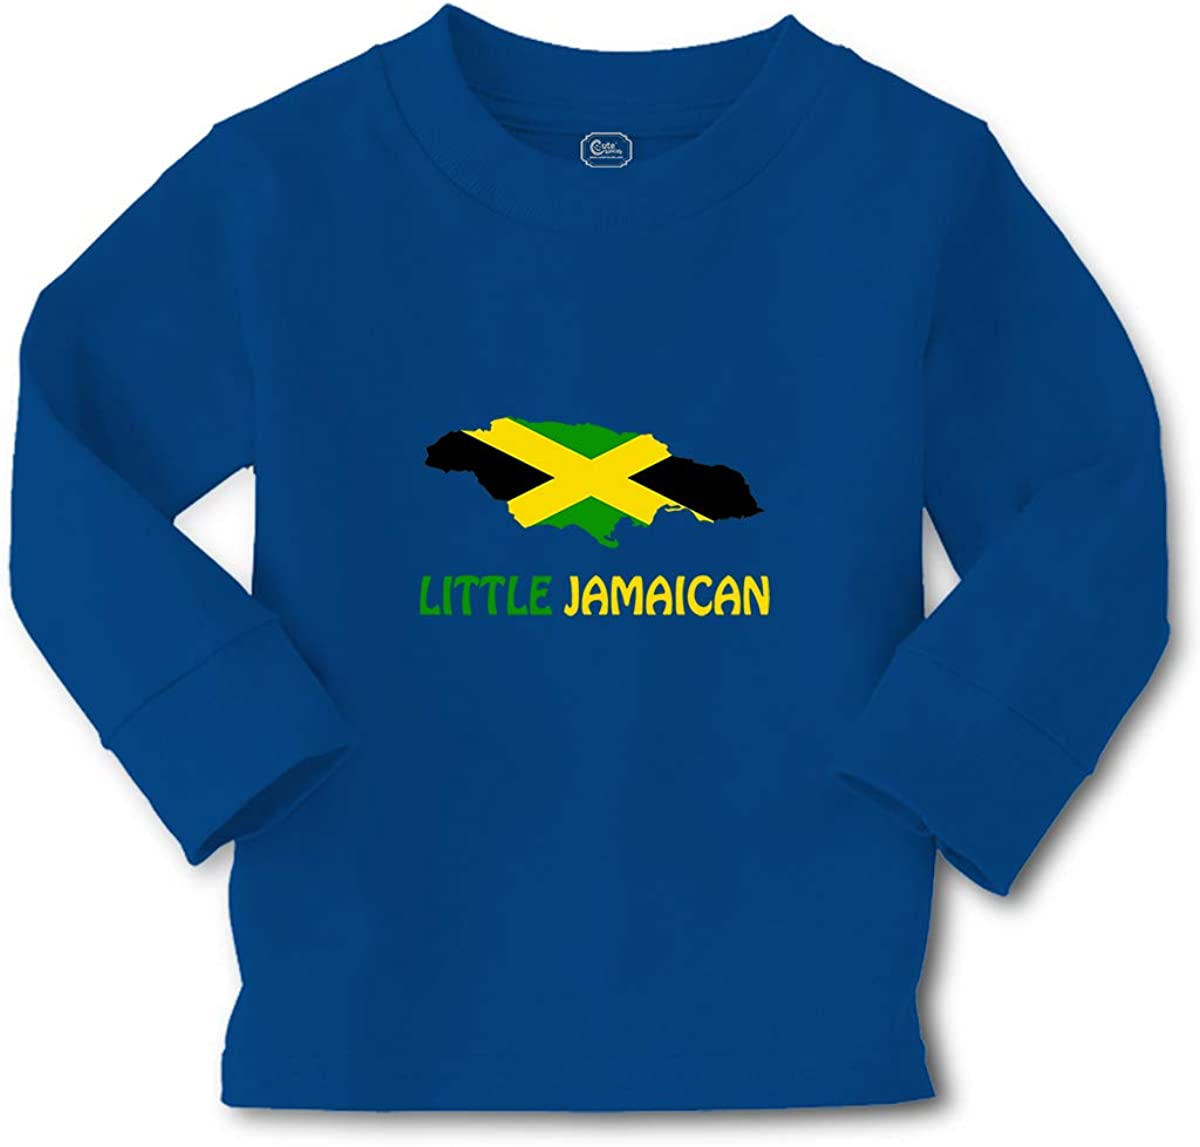 Cute Rascals Kids Long Sleeve T Shirt Little Jamaican Countries Cotton Boy & Girl Clothes